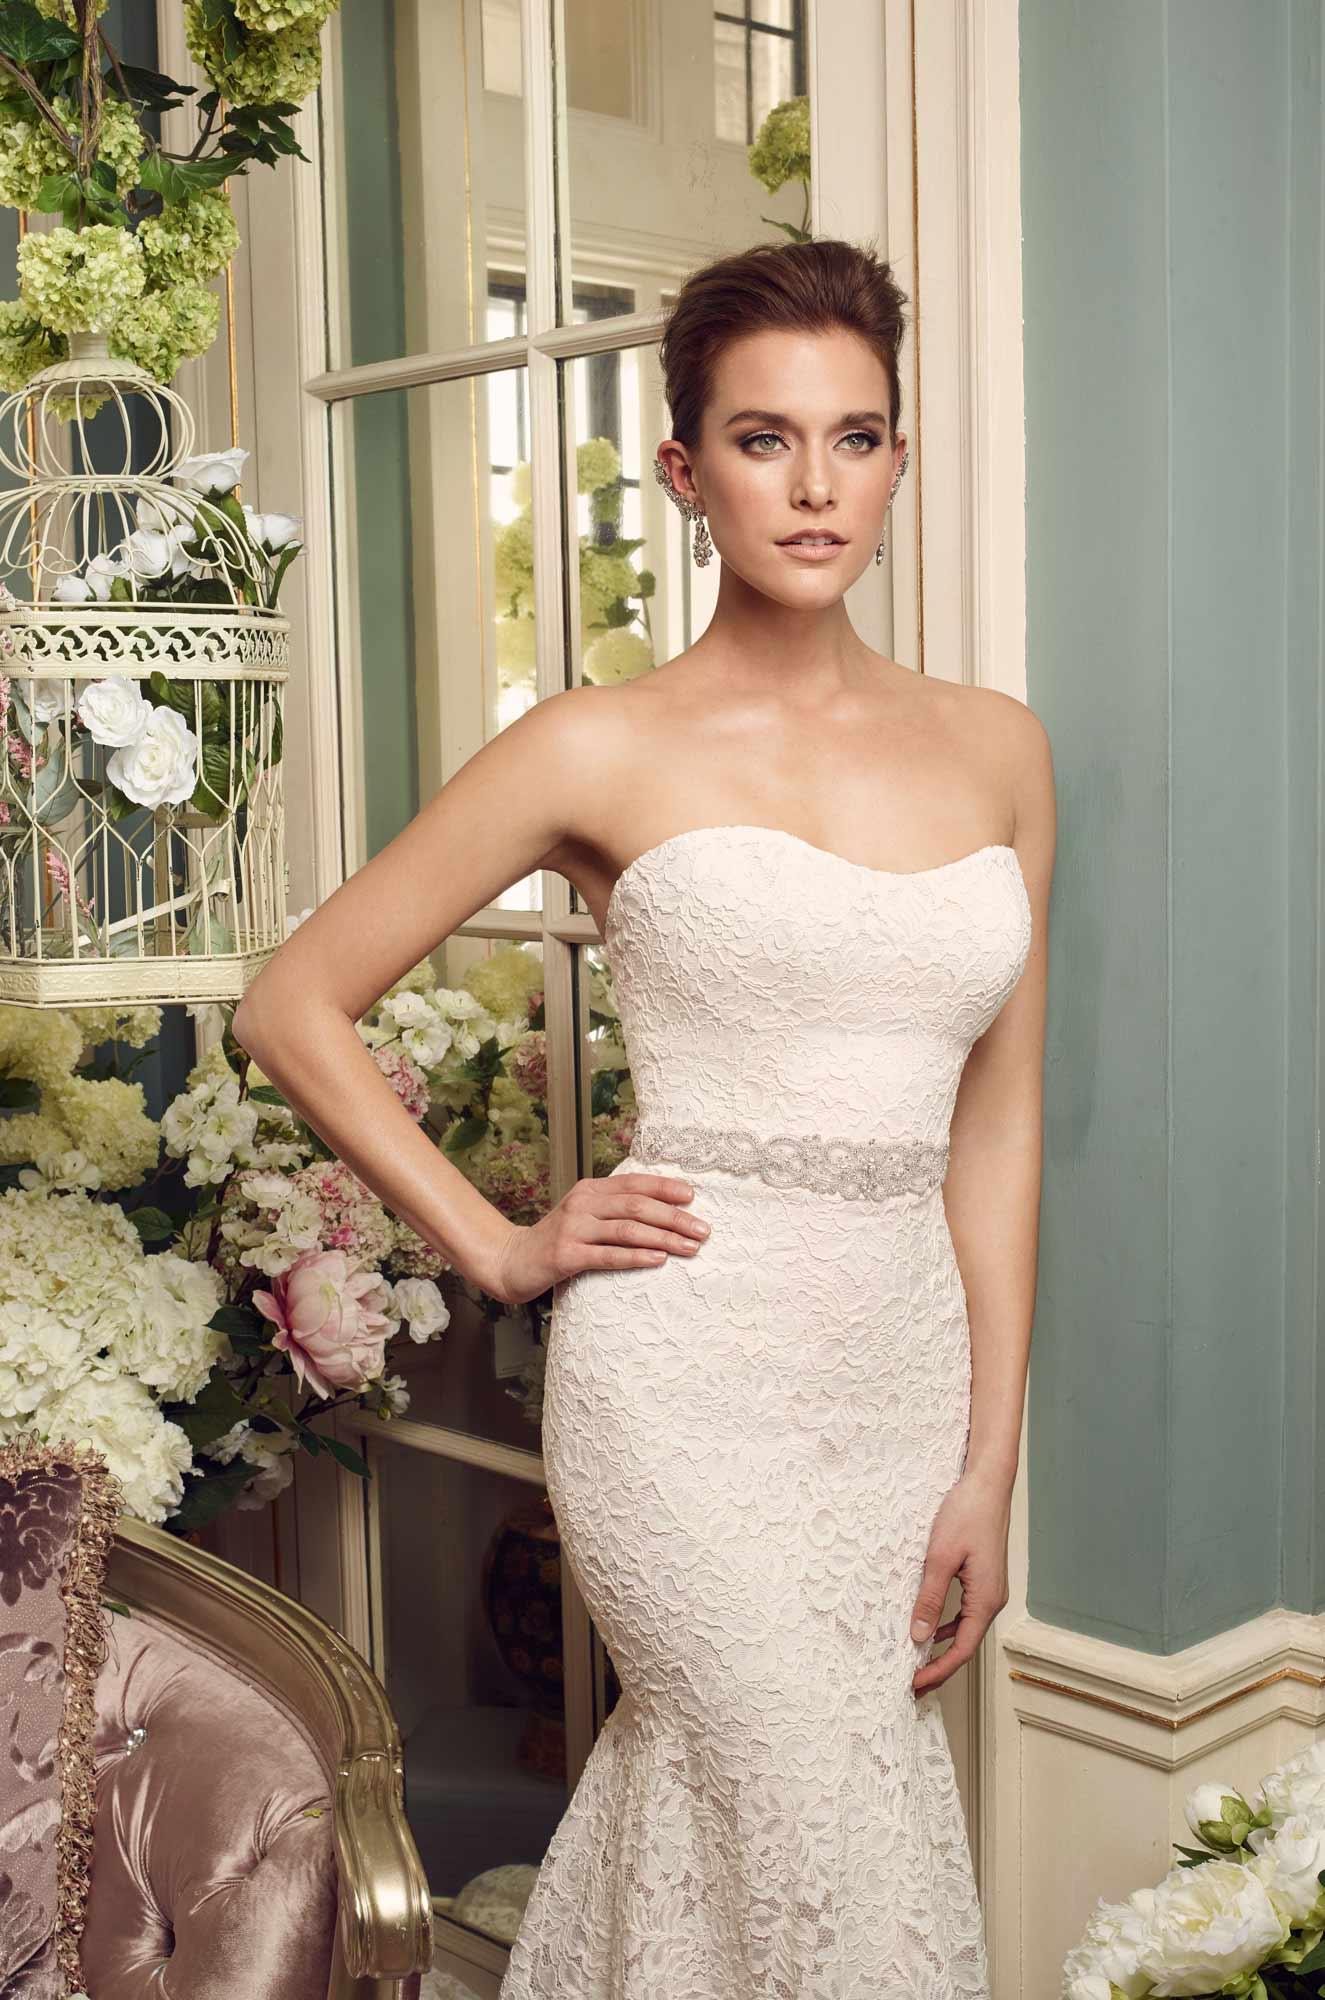 Lace wedding dress style 2165 mikaella bridal strapless lace wedding dress style 2165 mikaella bridal junglespirit Gallery